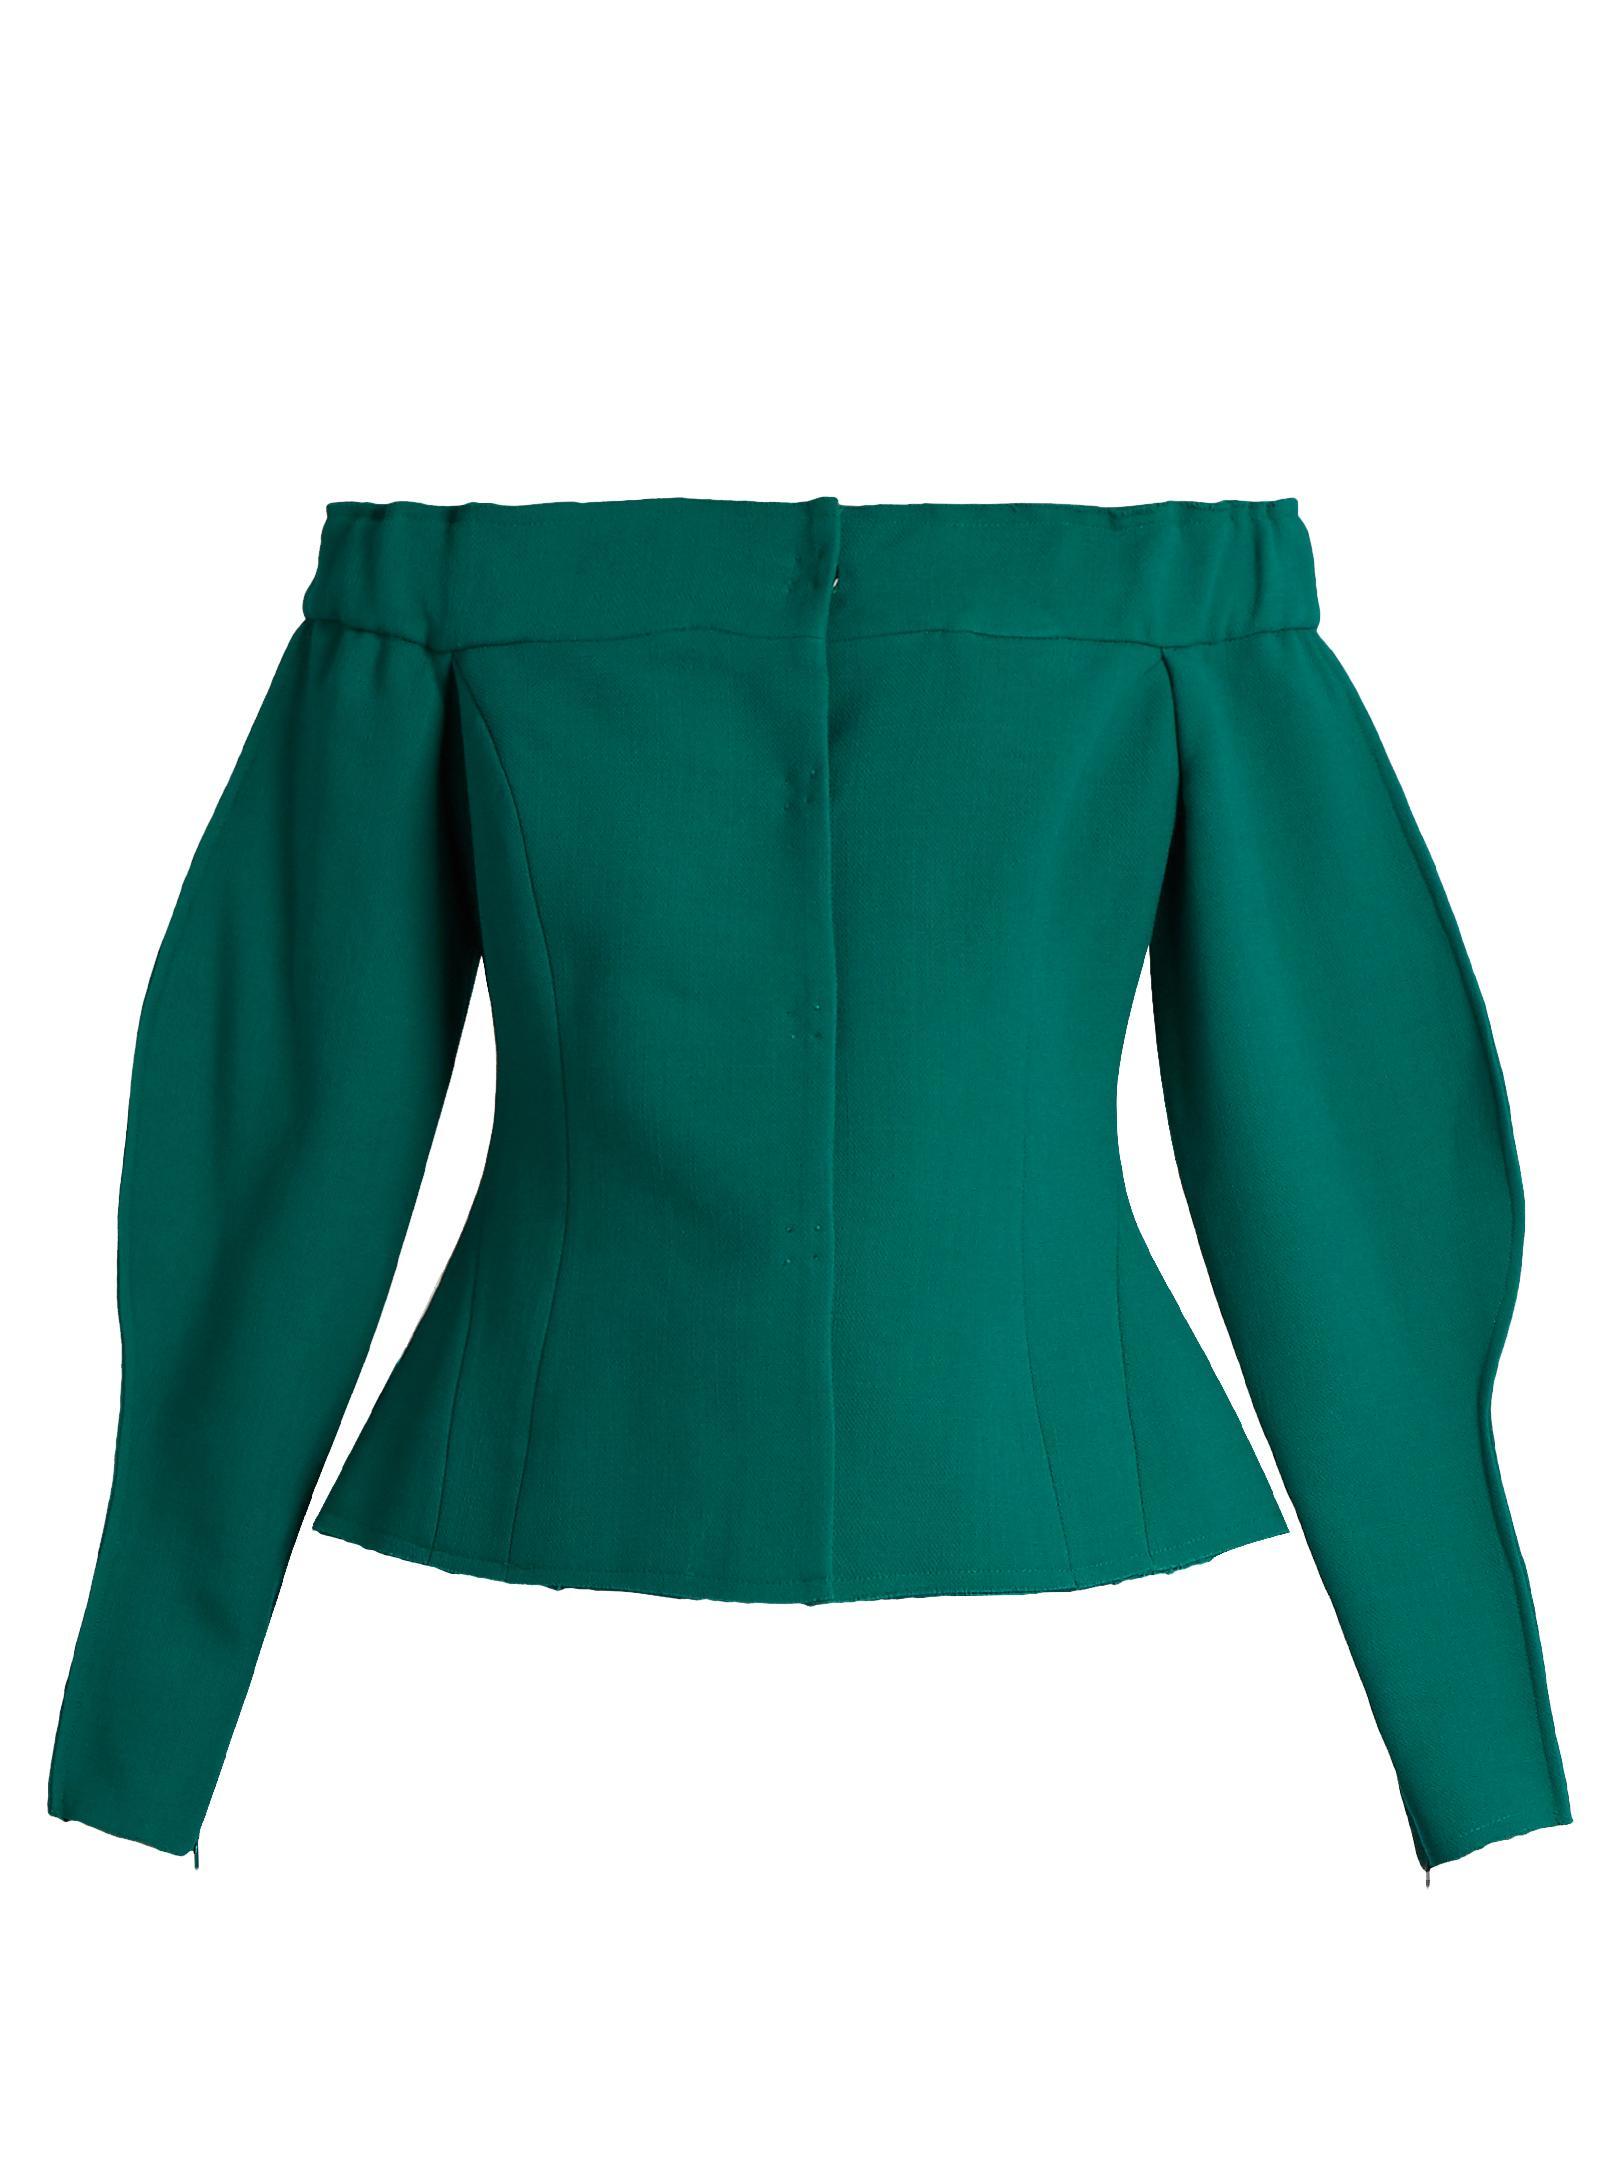 Natasha Zinko Off-shoulders Long Blouse in Green